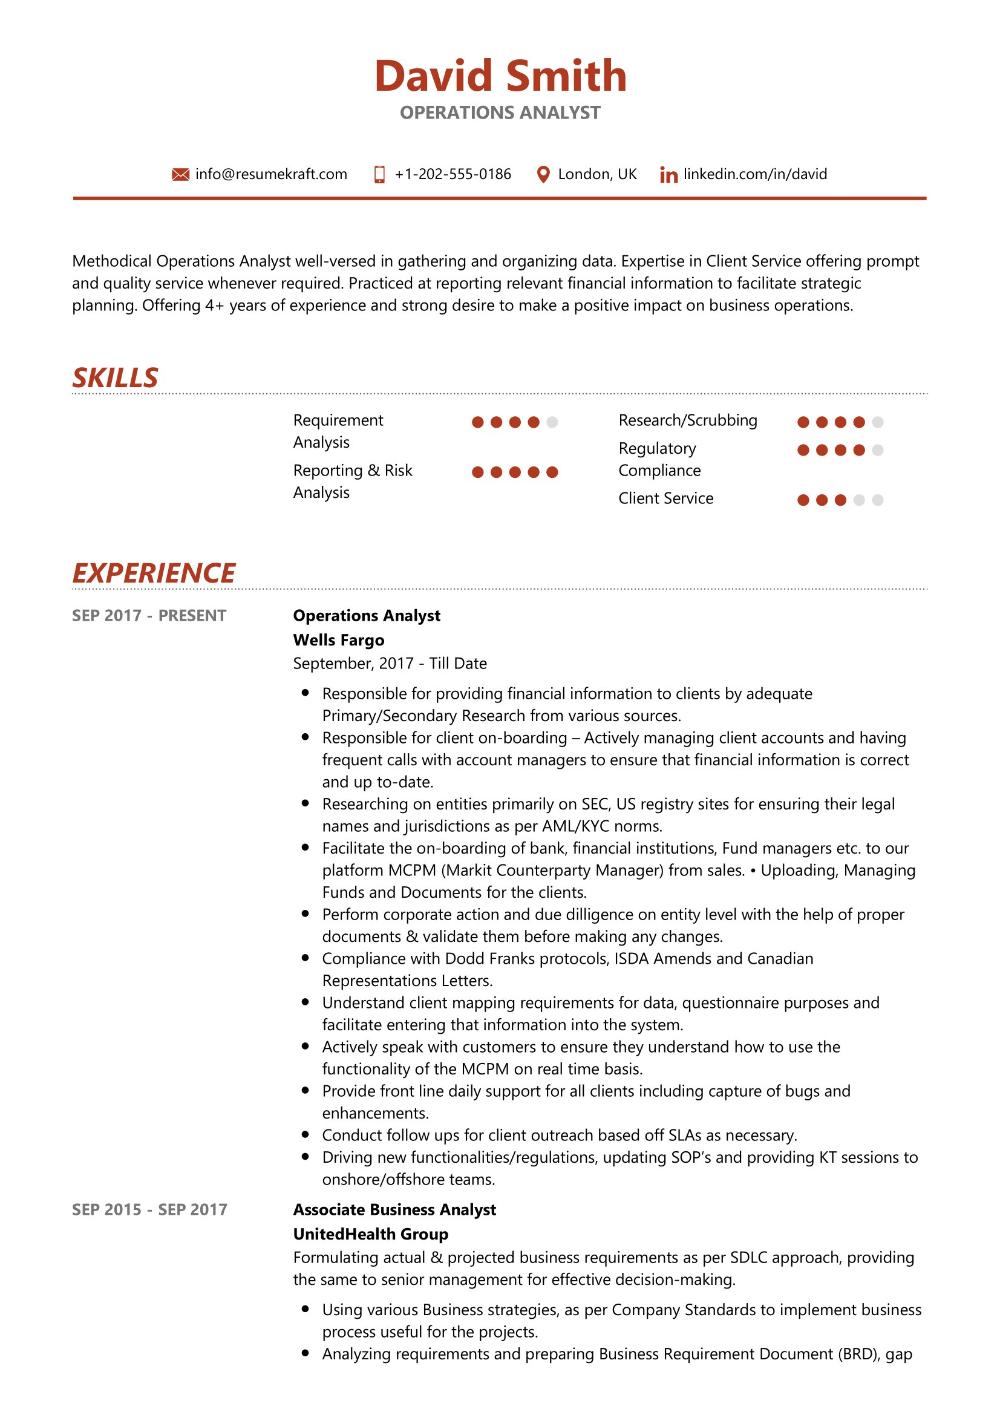 100 Professional Resume Samples For 2020 Resumekraft Data Analyst Resume Examples Business Data